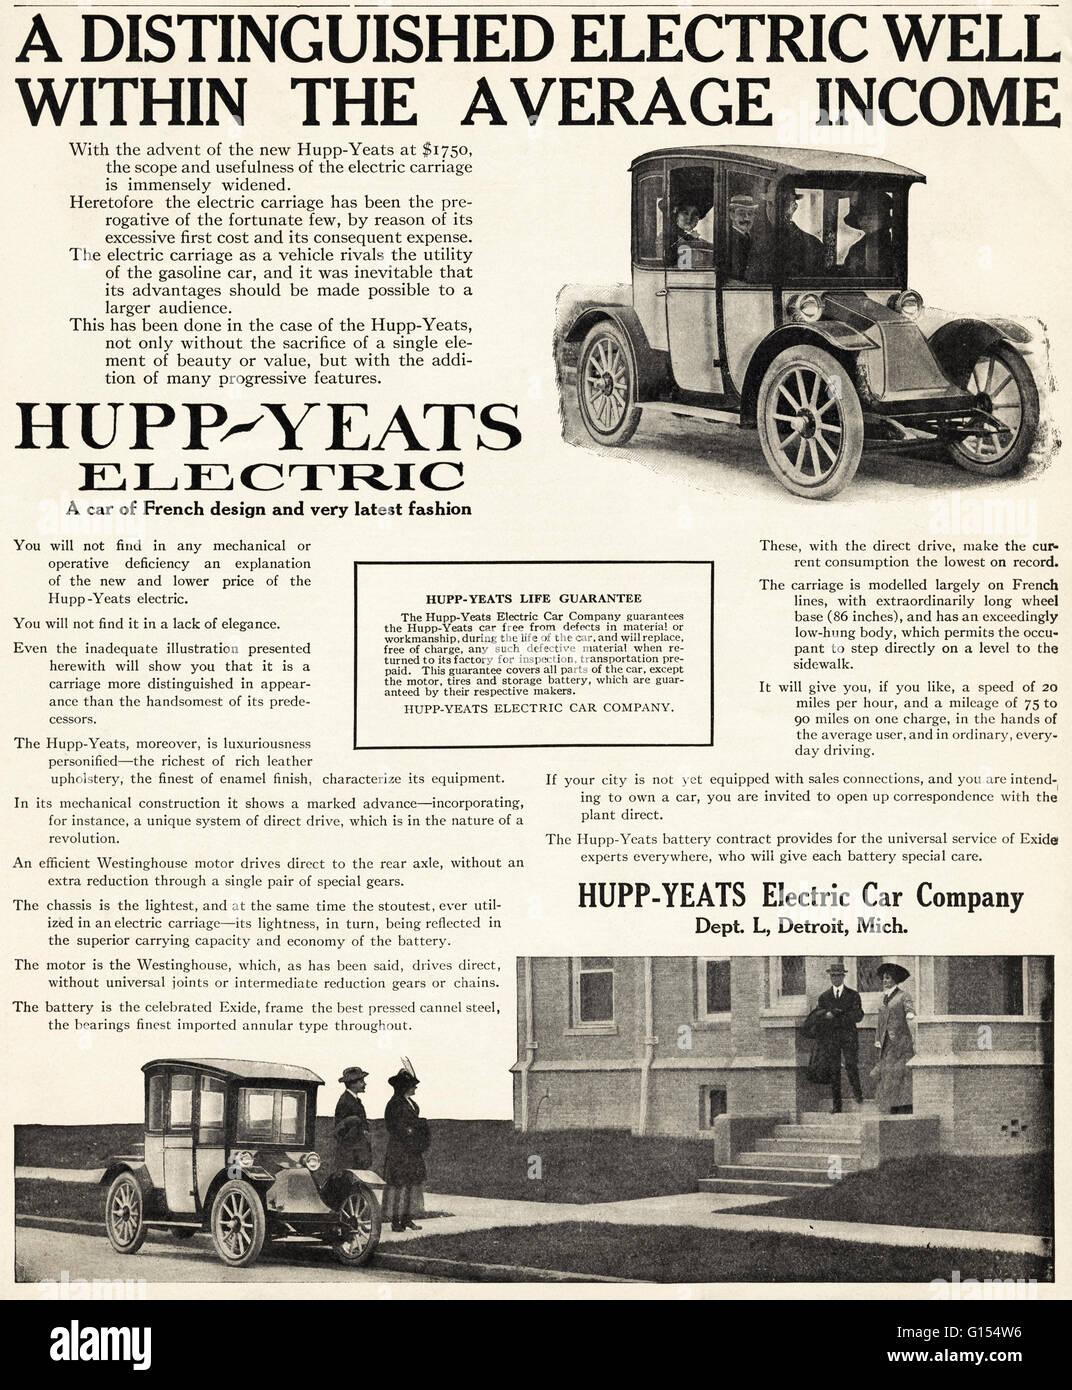 Vintage Electric Car Stock Photos & Vintage Electric Car Stock ...